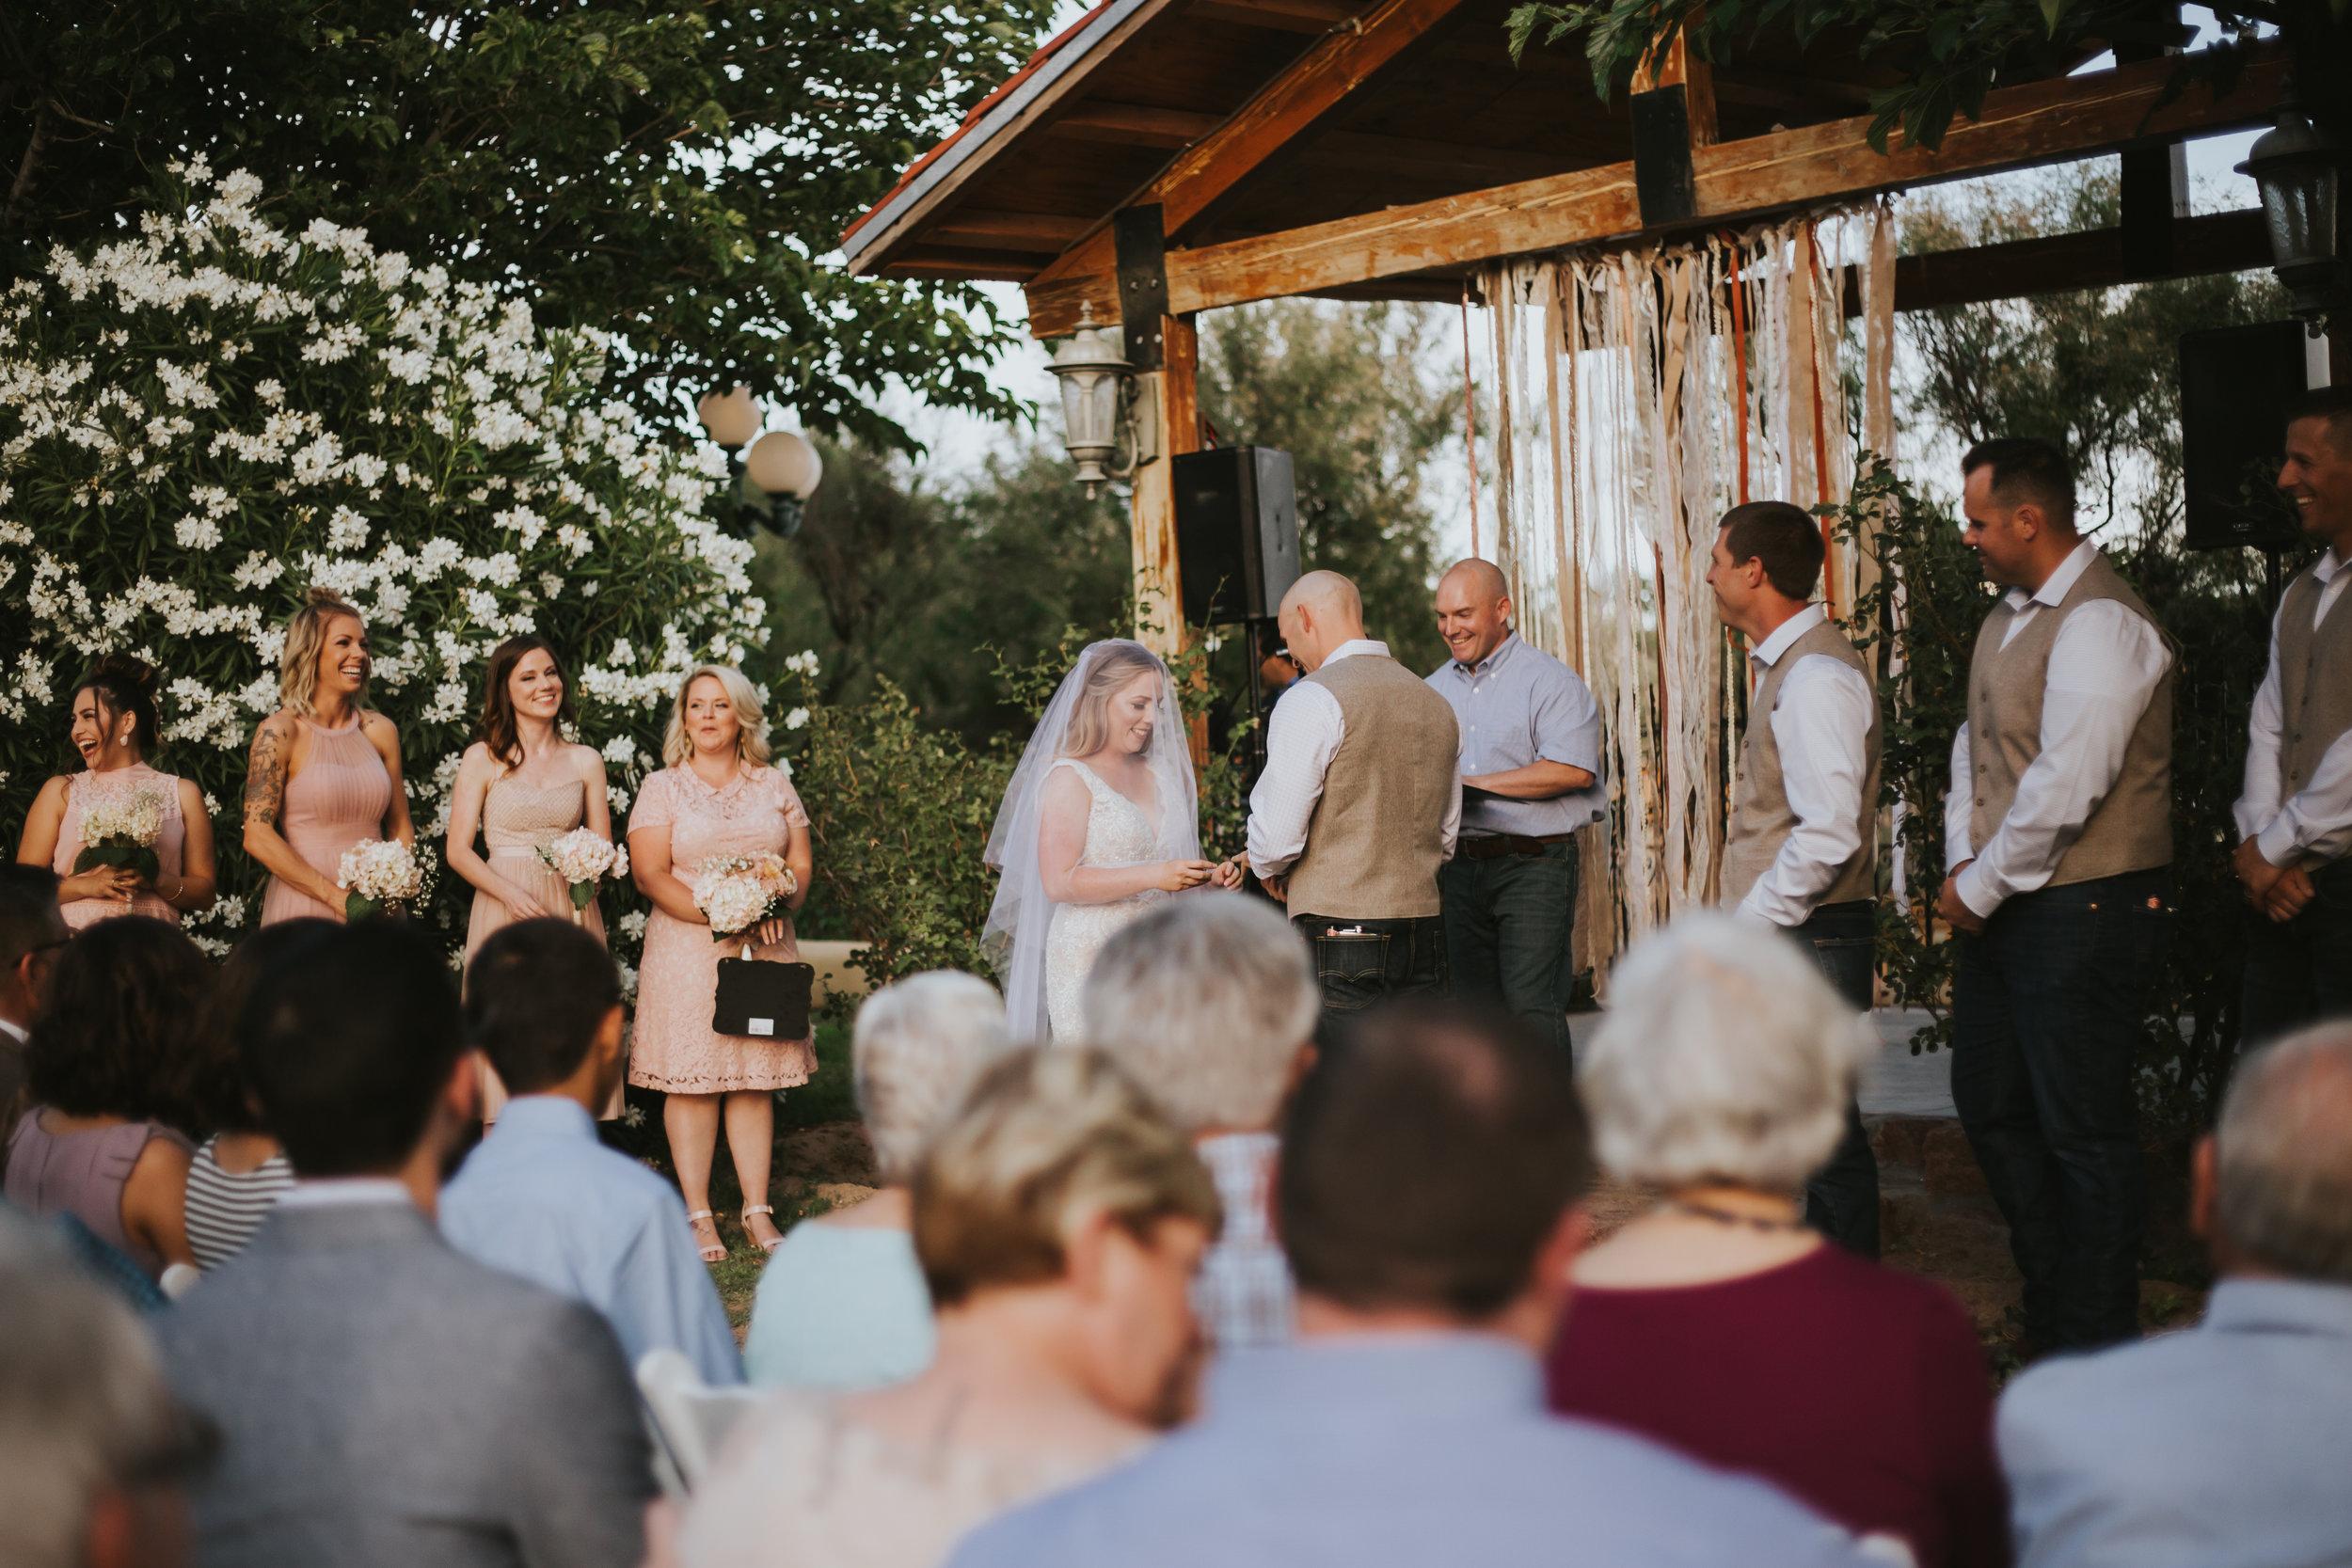 william-taylor-fabens-texas-wedding-34